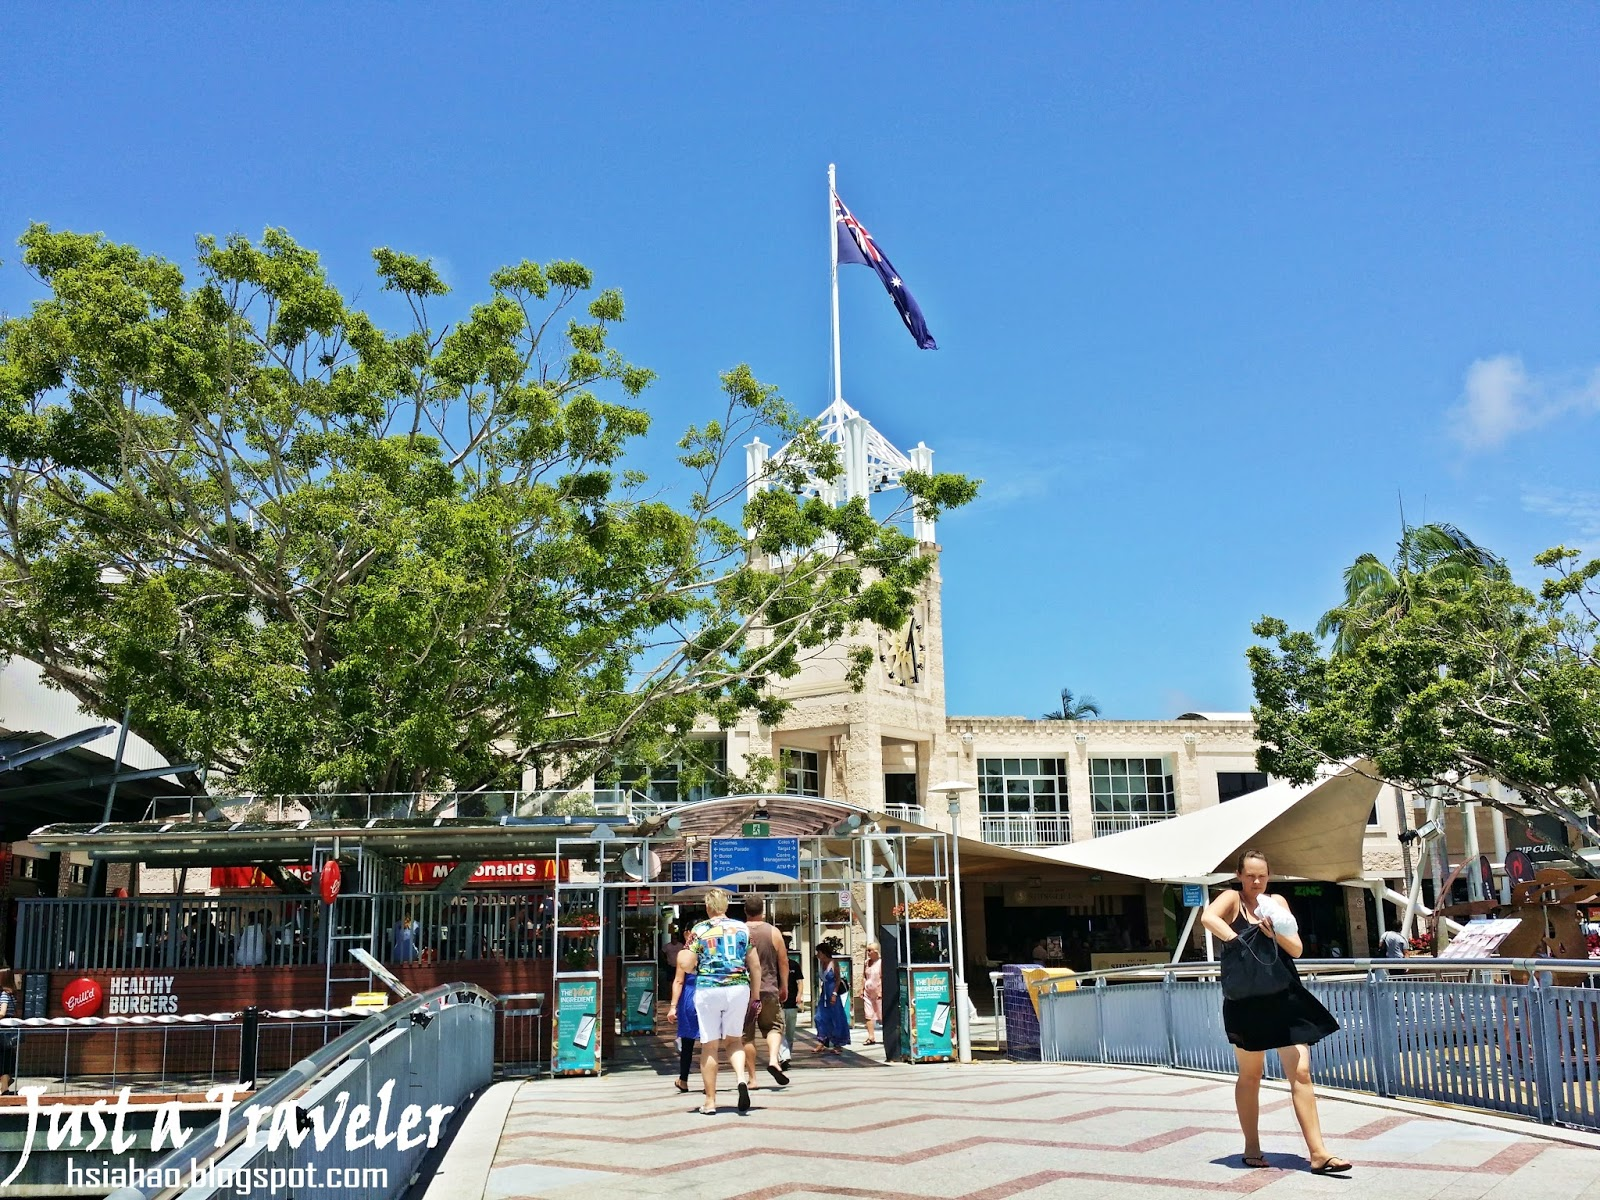 陽光海岸-海灘-一日遊-遊記-Sunshine-Plaza-陽光海岸景點-推薦-住宿-Sunshine-Coast